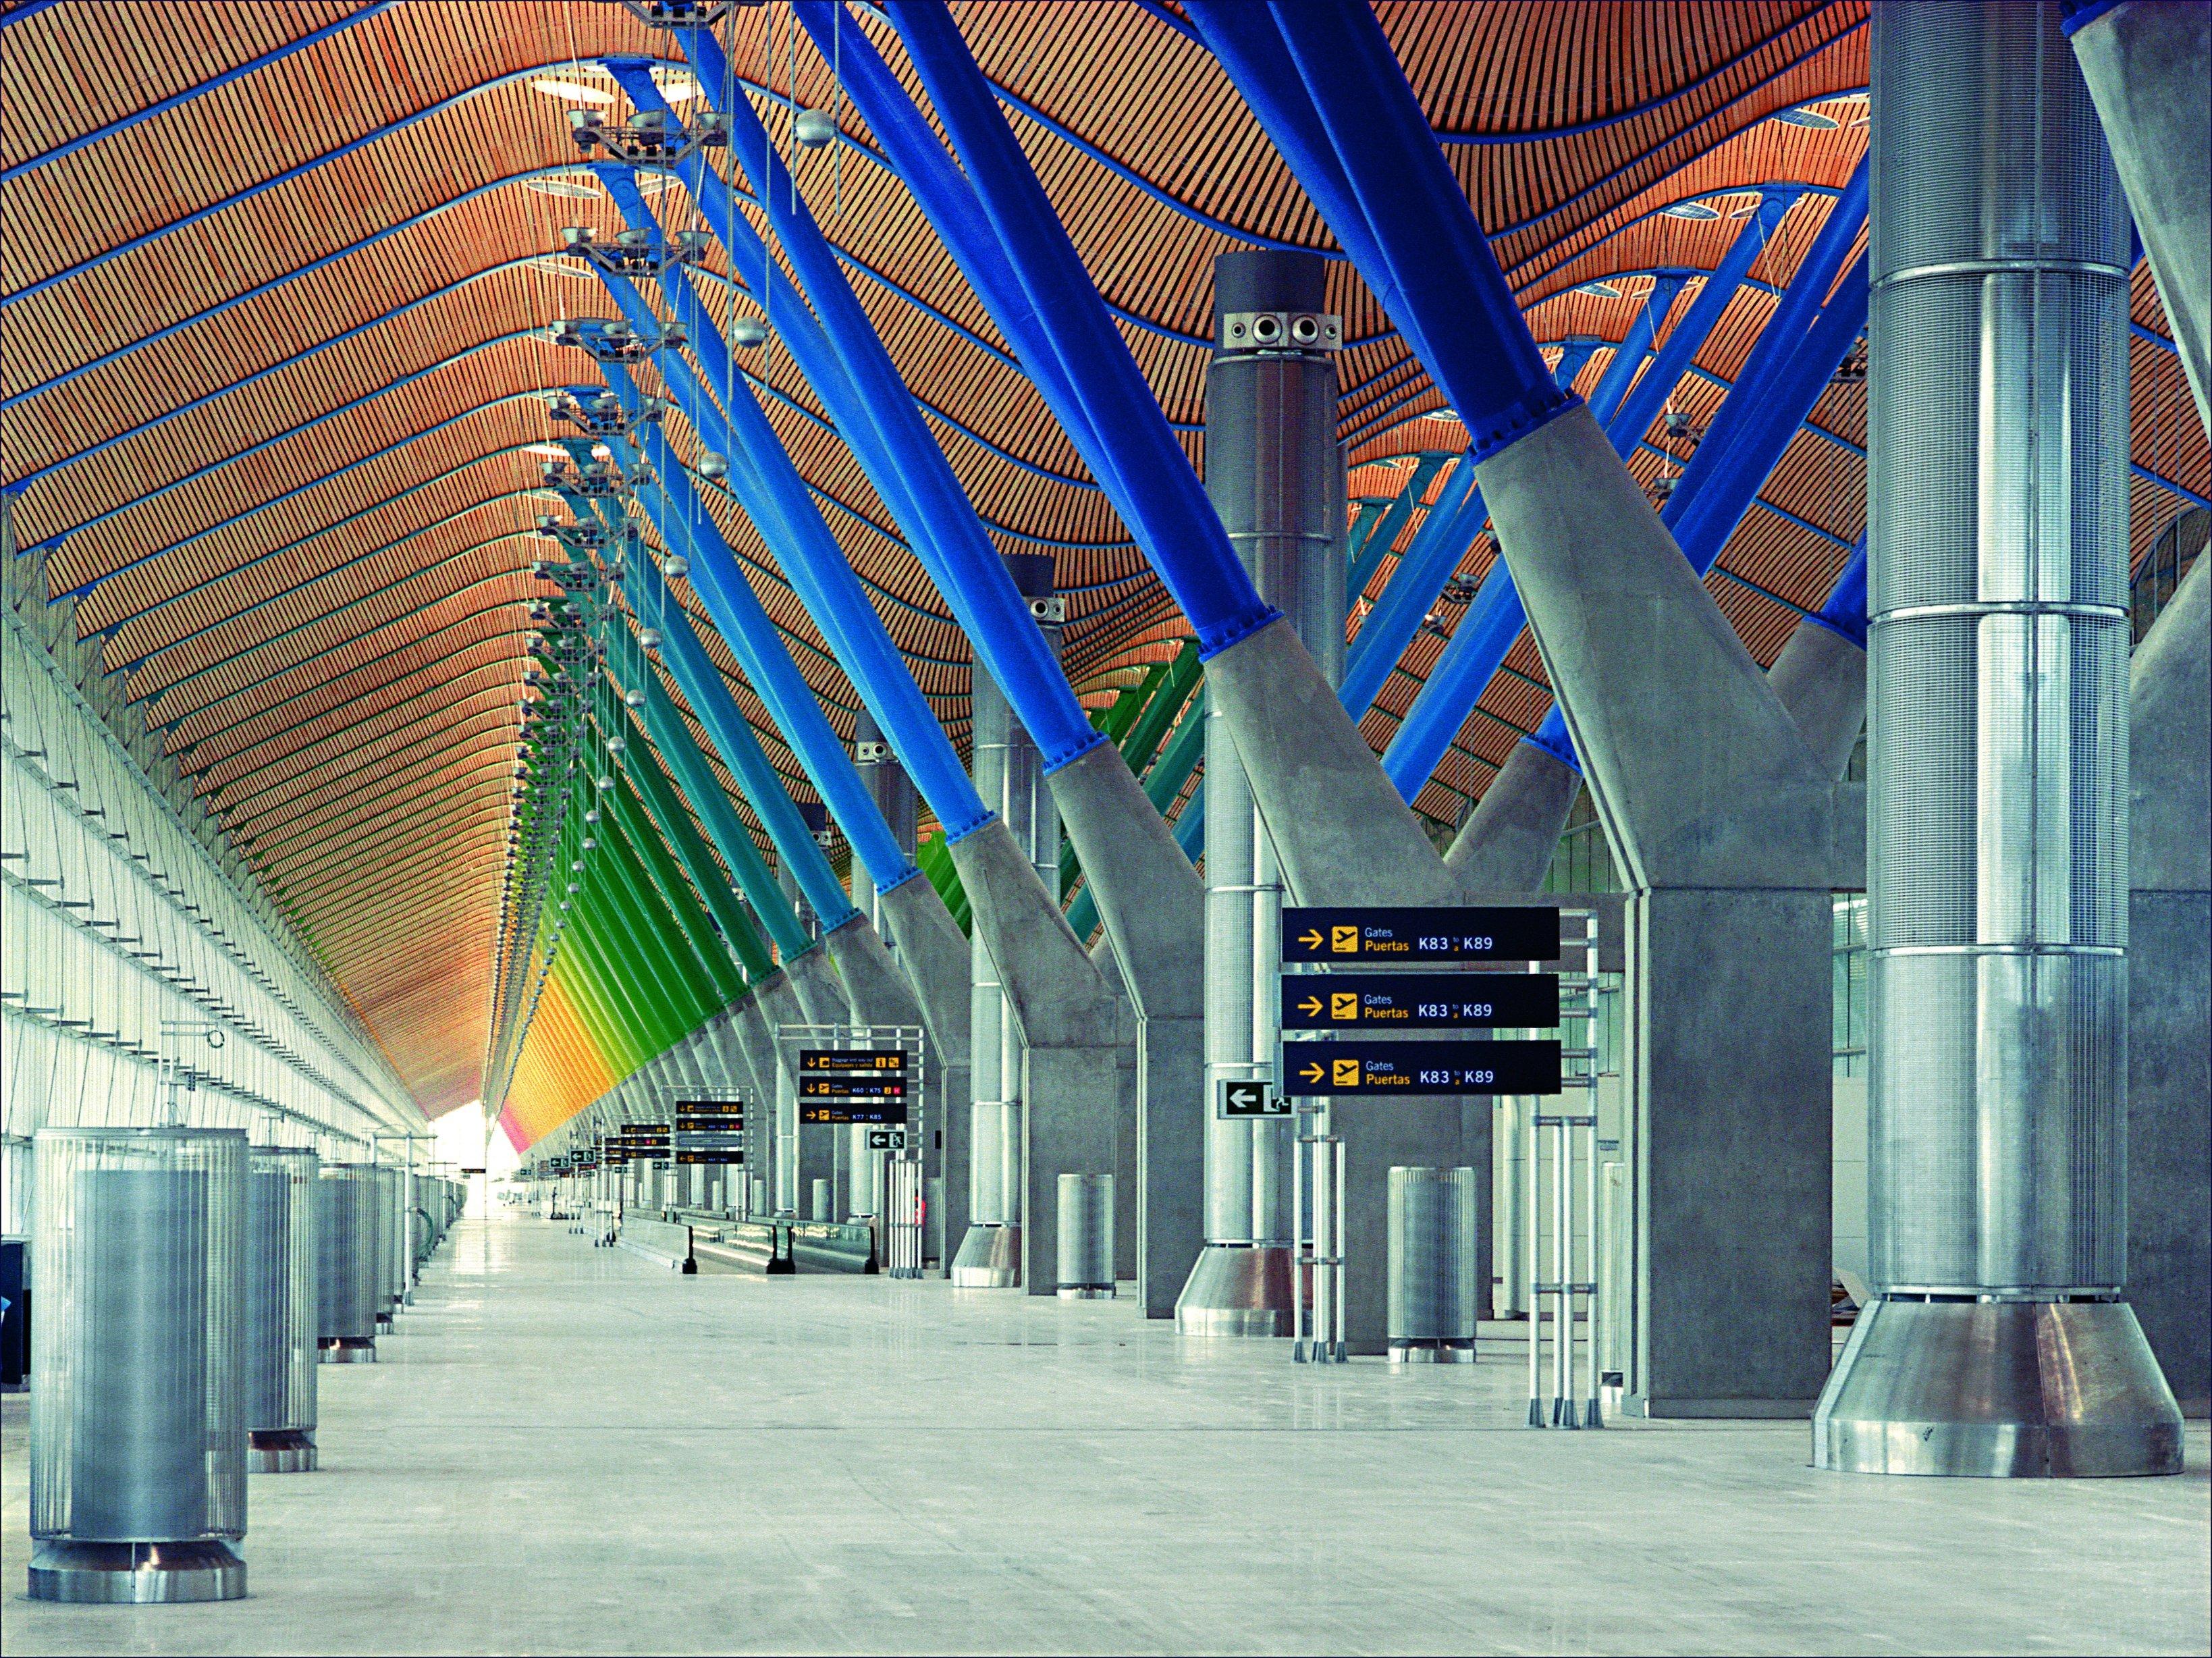 Columns airport property